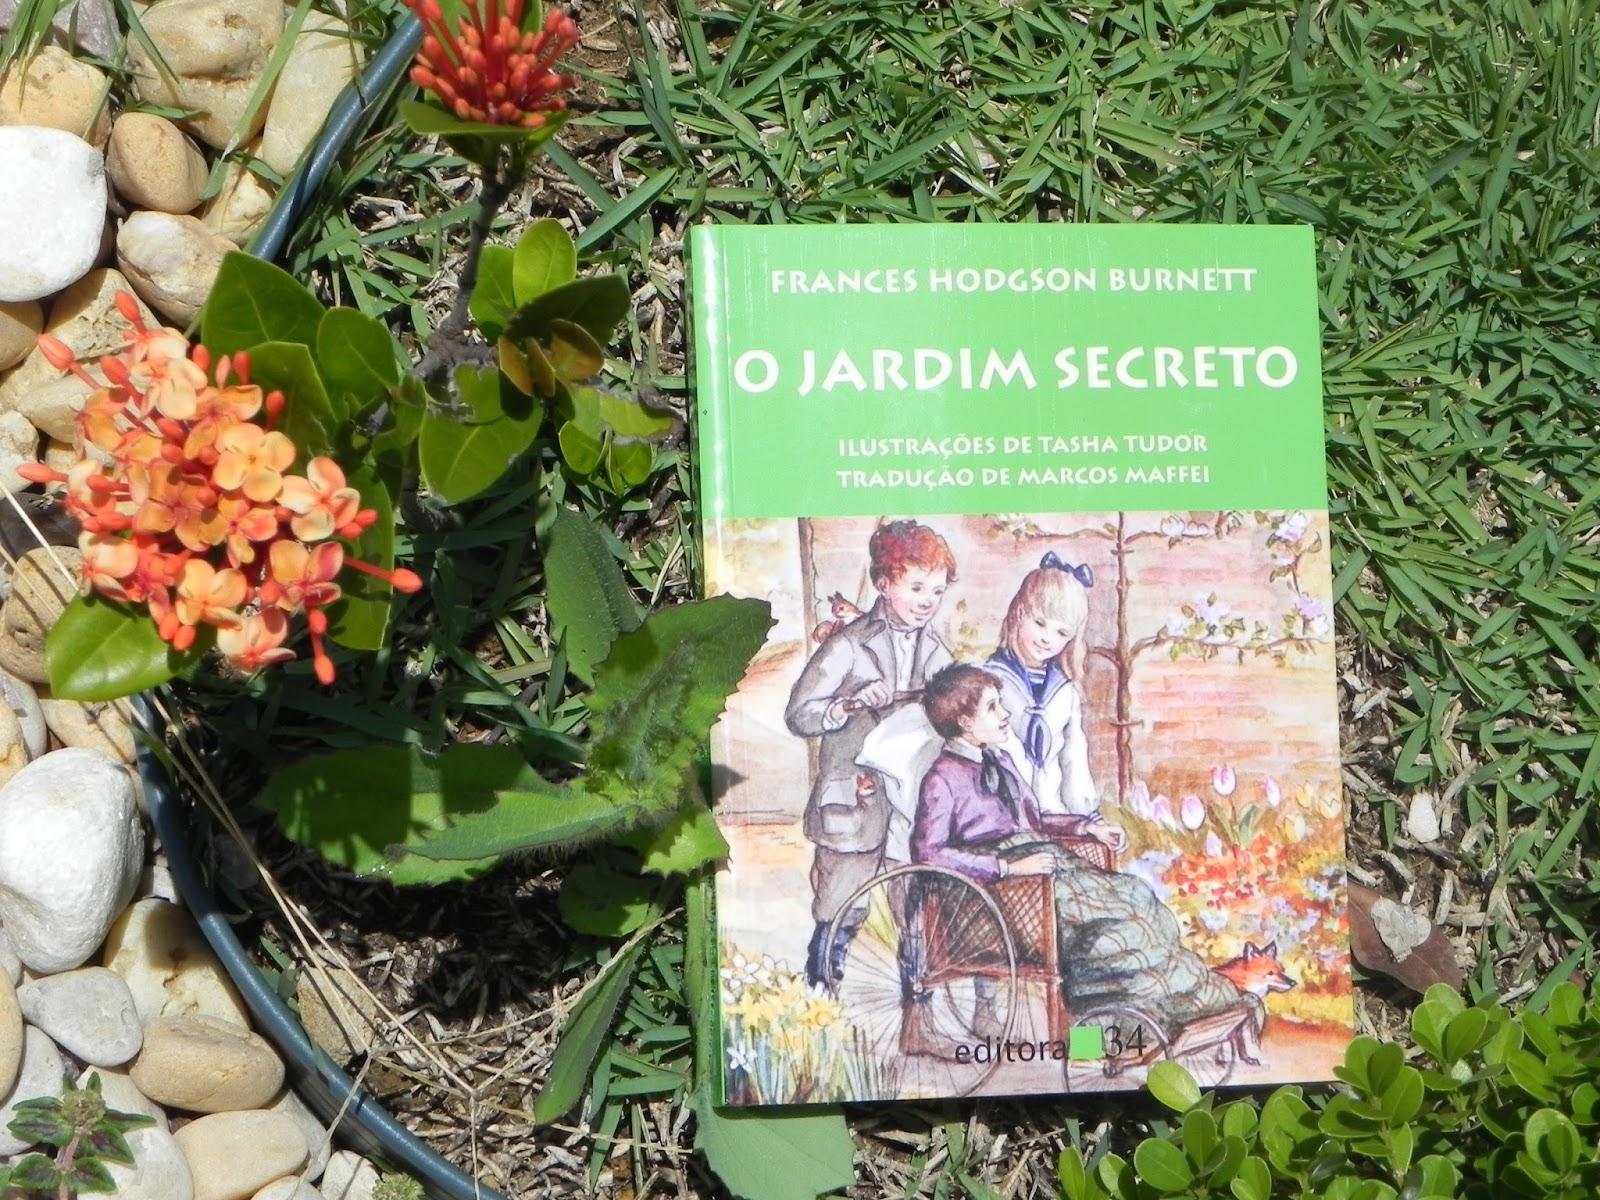 o jardim secreto frances hodgson burnett